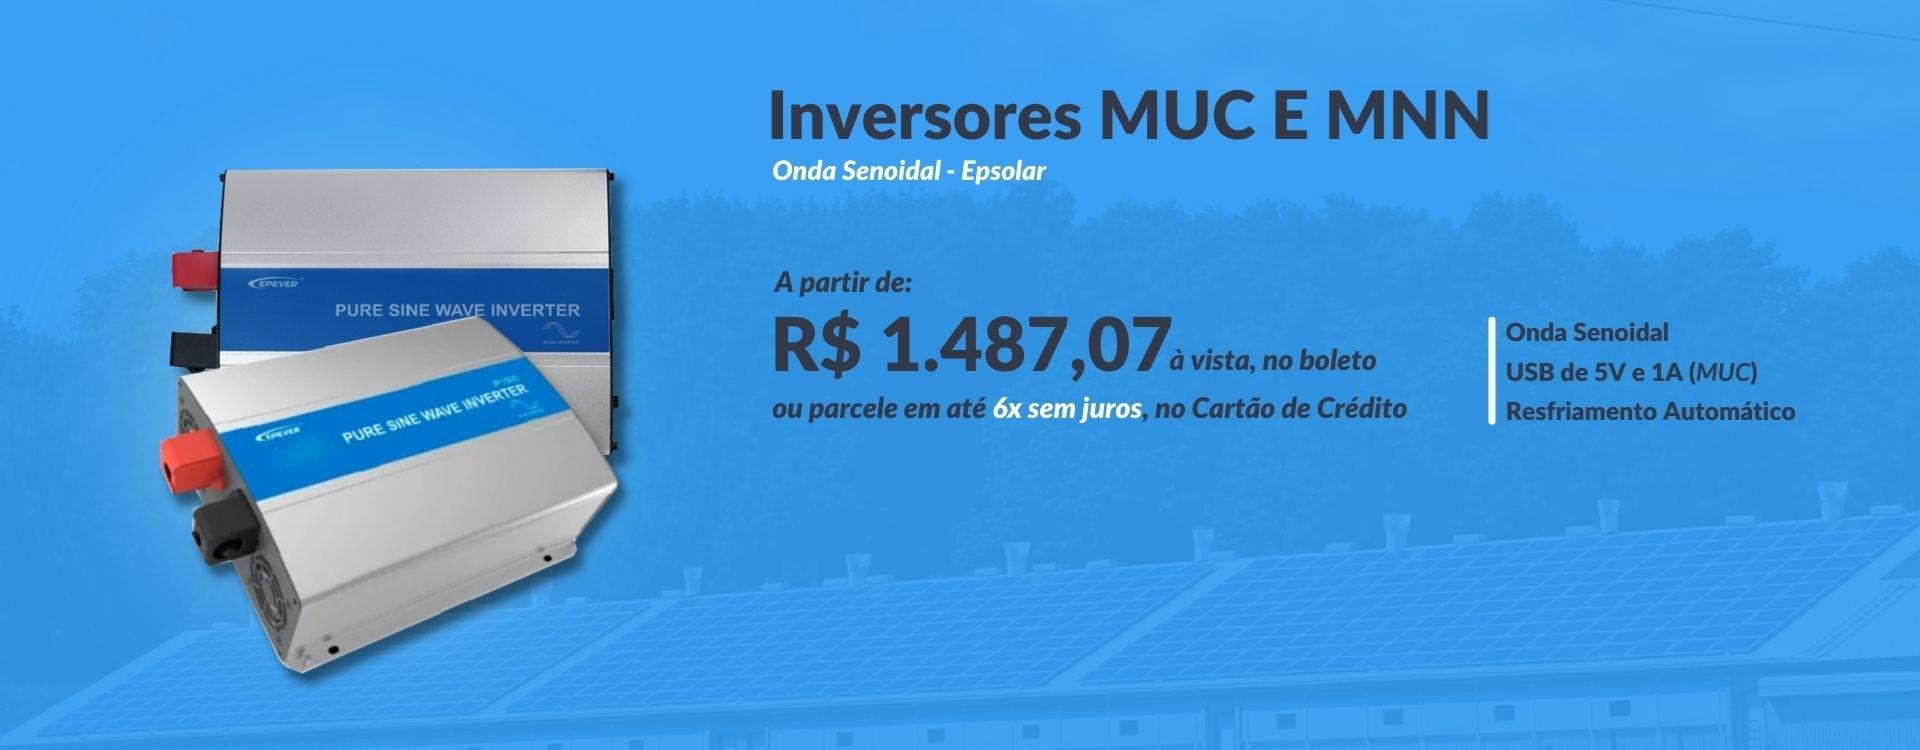 Inversormnnemuc